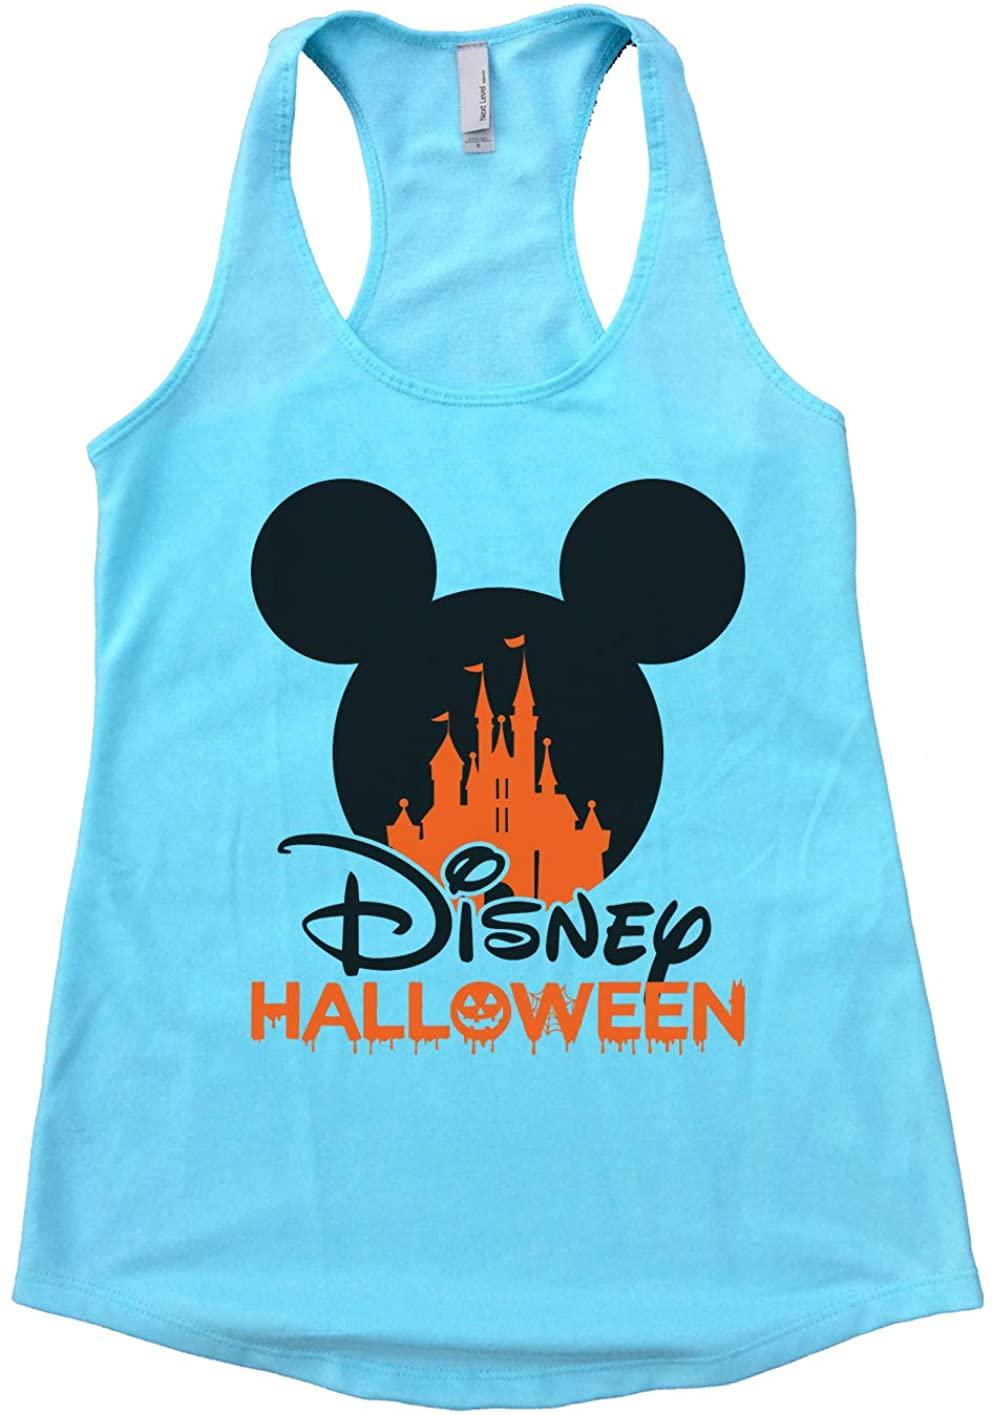 "Womens Flowy Mickey Mouse Tank Top ""Disney Halloween Disney World Tank X-Large, Cancun Blue"